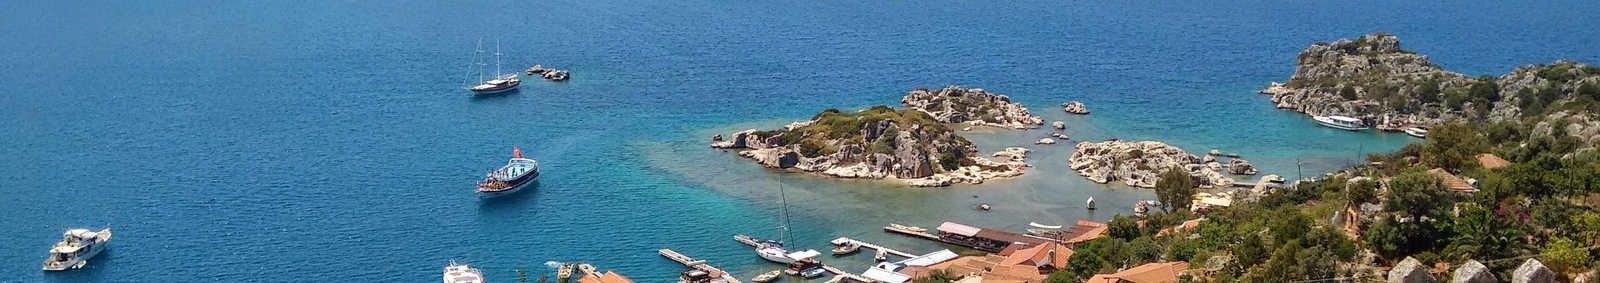 View from Simena castle, Turkey